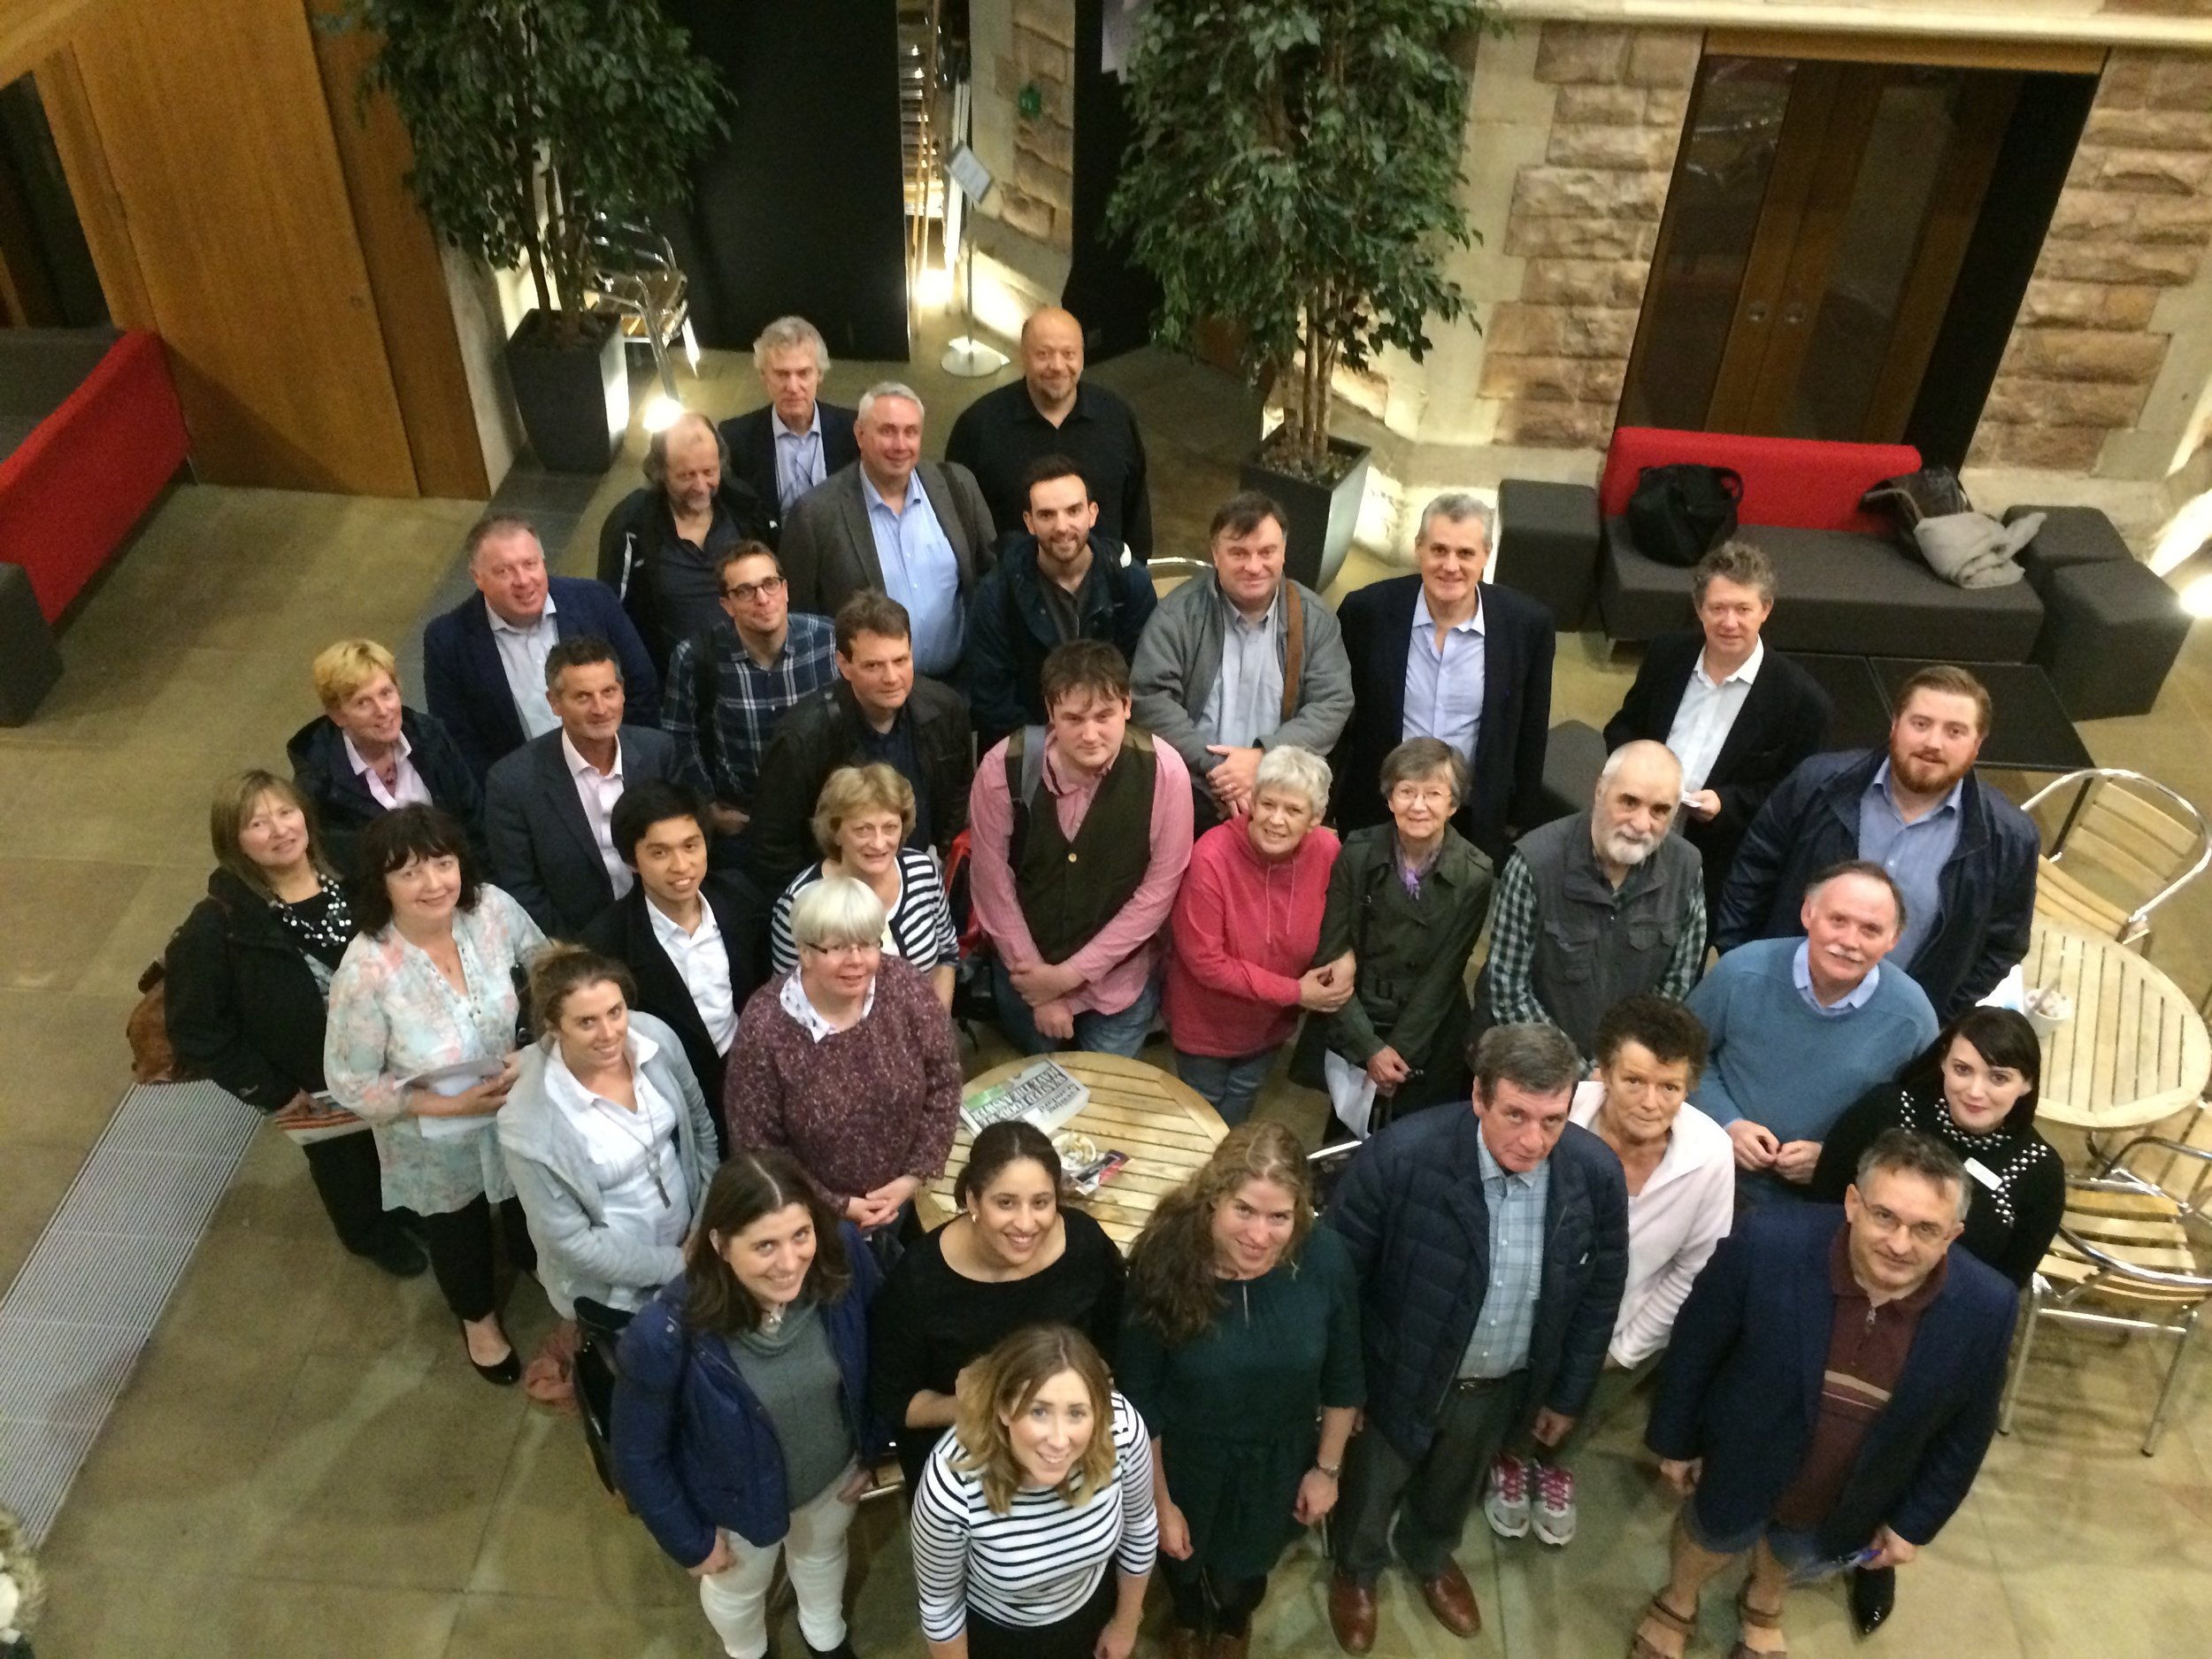 The Irish Language Classes at ICC, Hammersmith, continue into 2017.